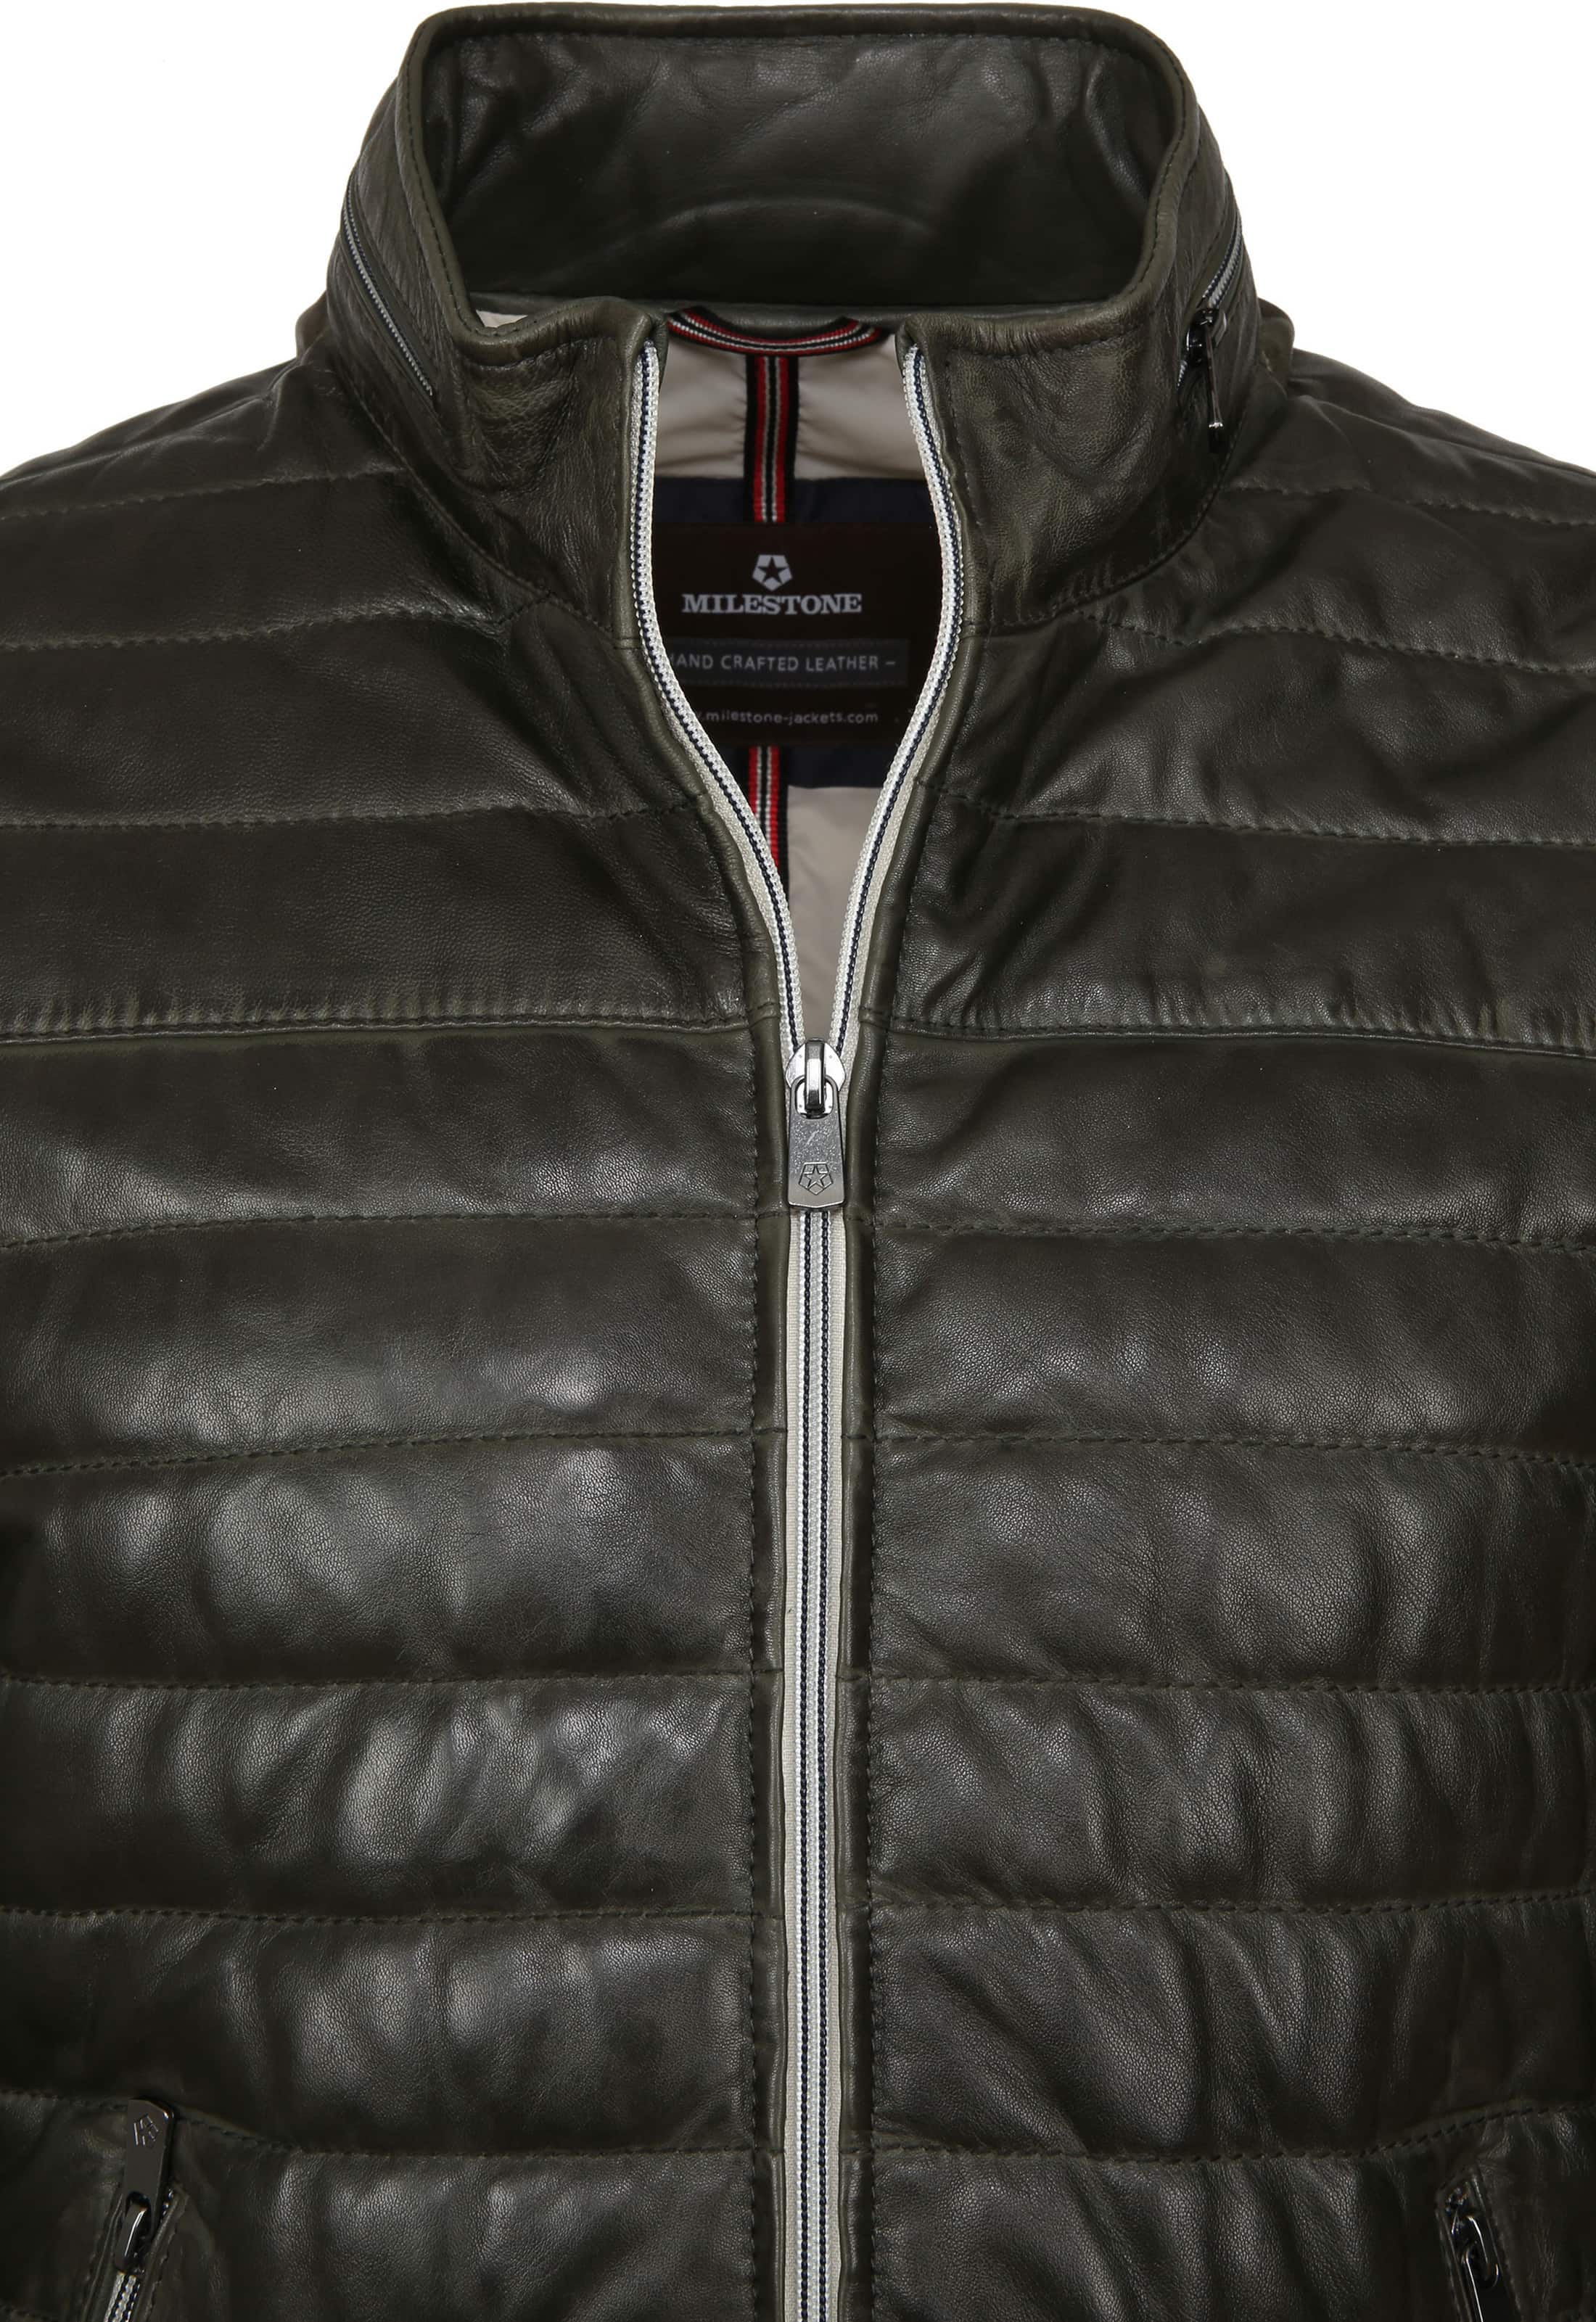 Milestone Tereno Leather Jacket Dark Green foto 2